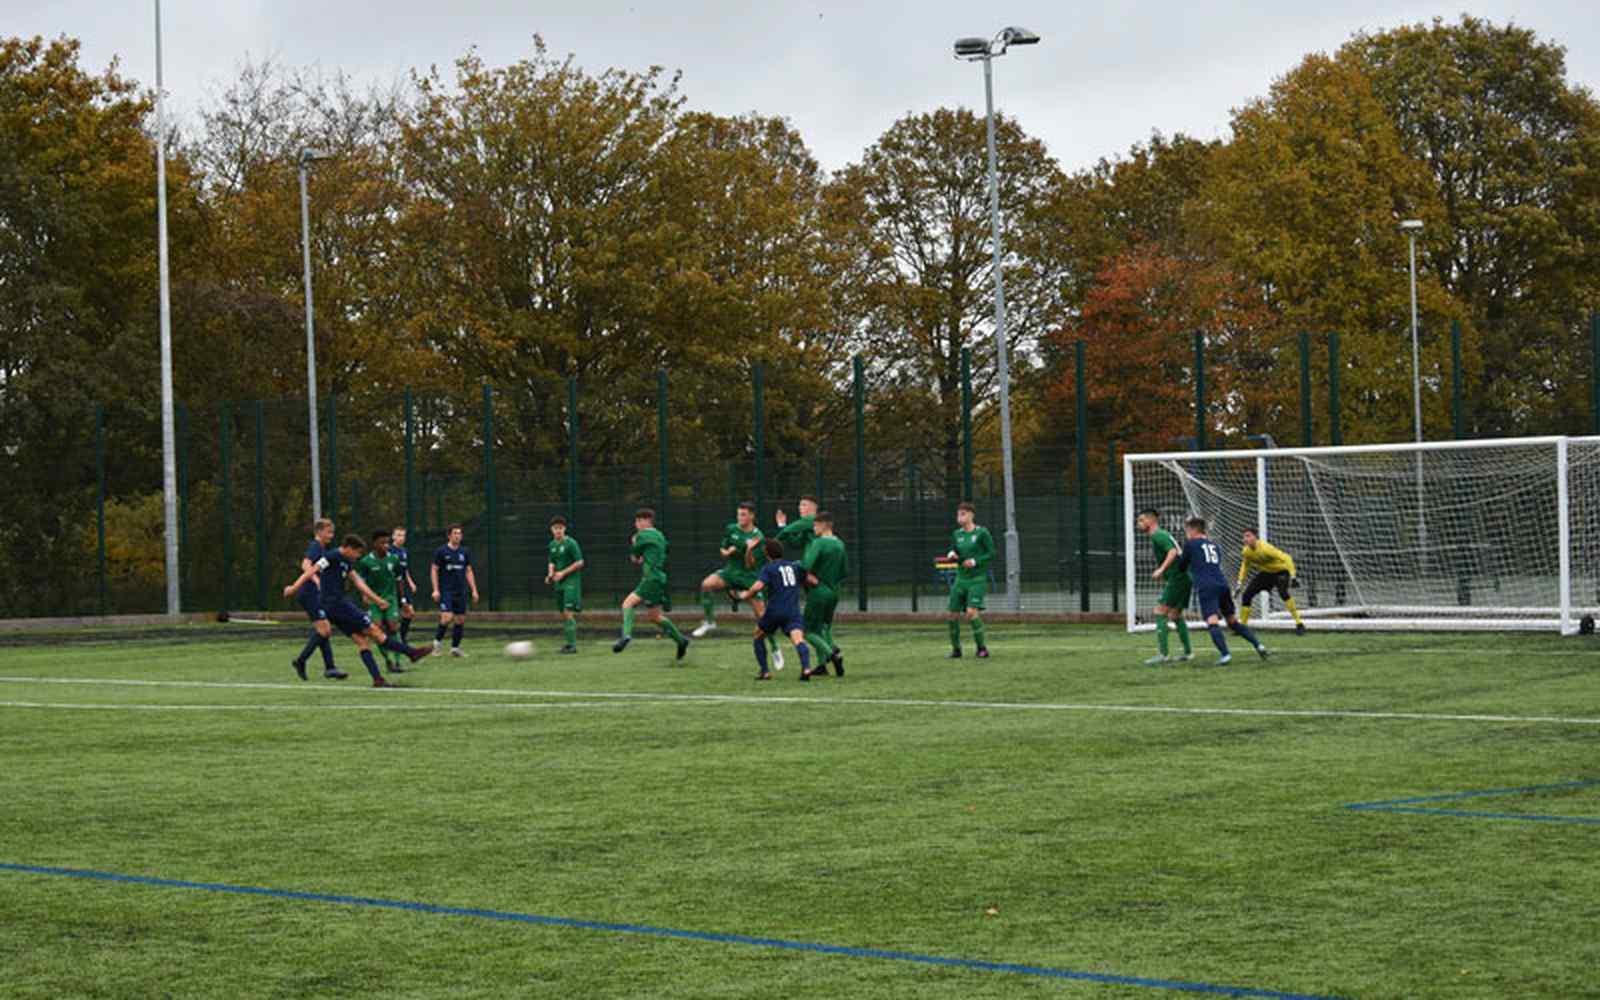 i2i Academy play match against Sheffield Wednesday Academy team